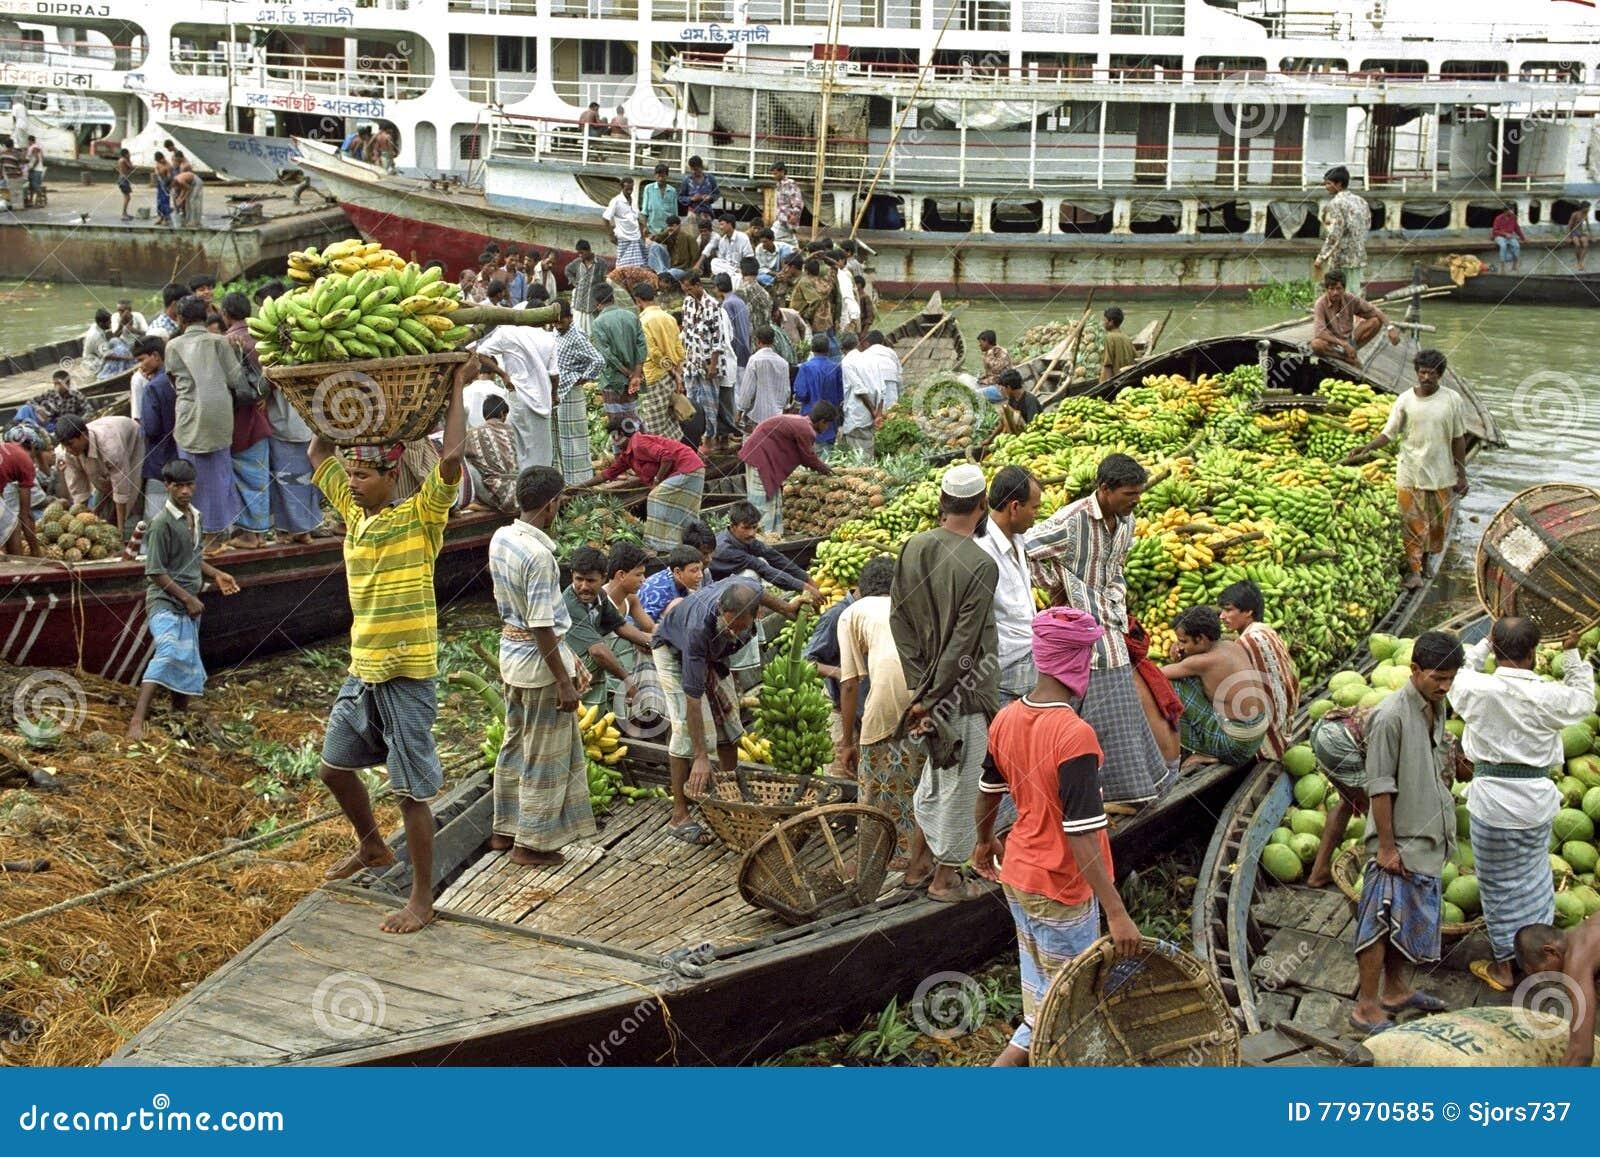 Handel in tropische vruchten in Dhaka, Bangladesh